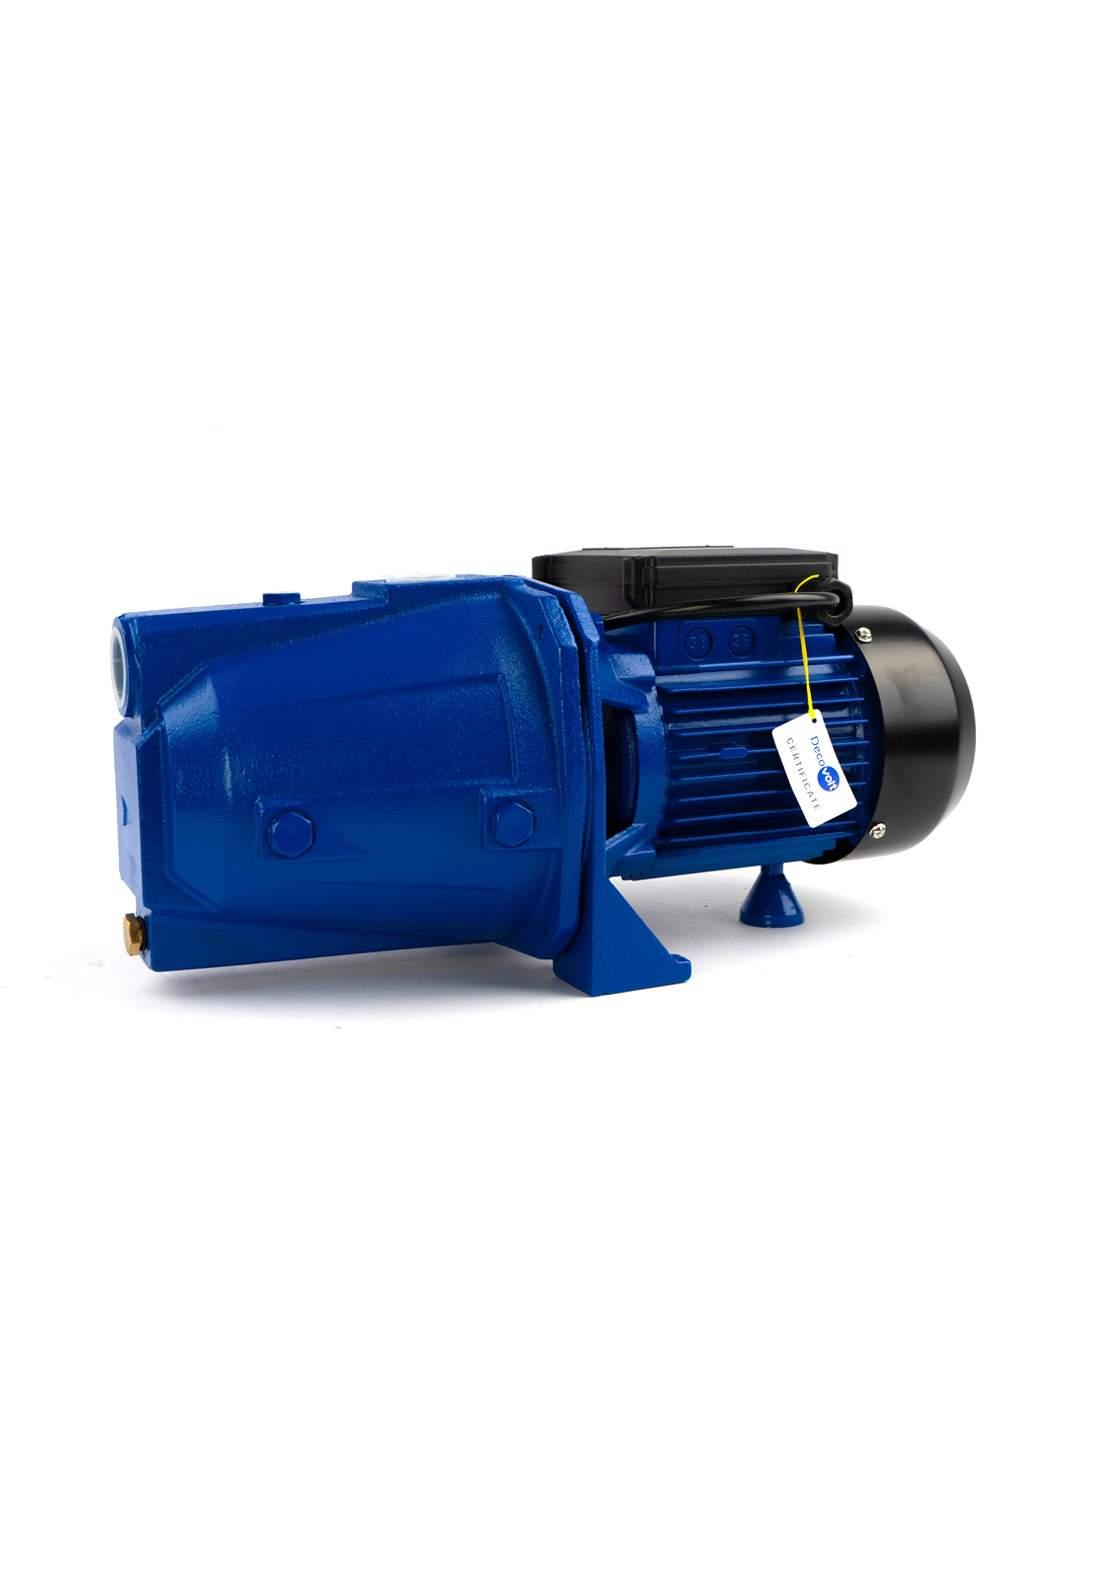 DecoVolt 4901 water pump 220 w مضخة مياه 220 واط 1 حصان